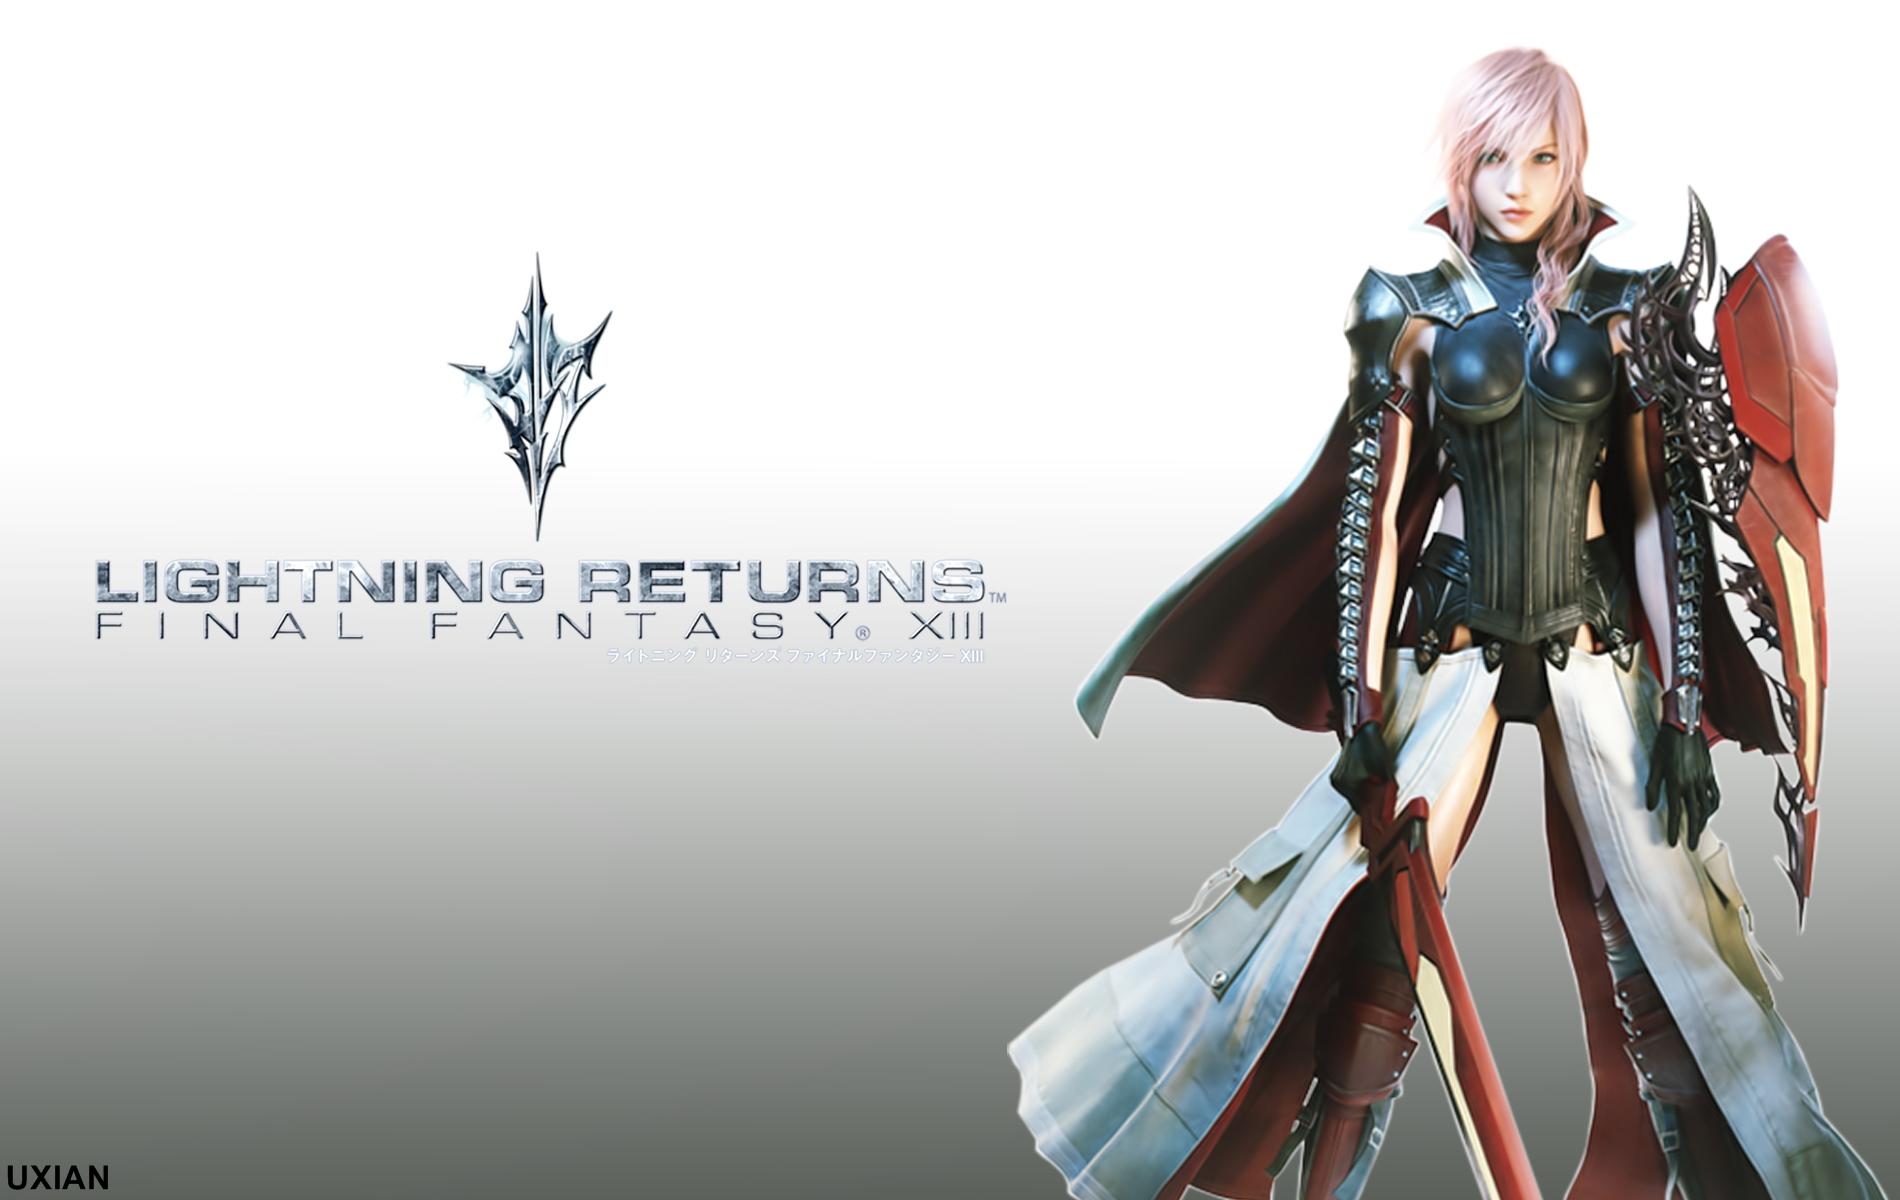 E3 Hands-On Impressions: Lightning Returns: Final Fantasy XIII